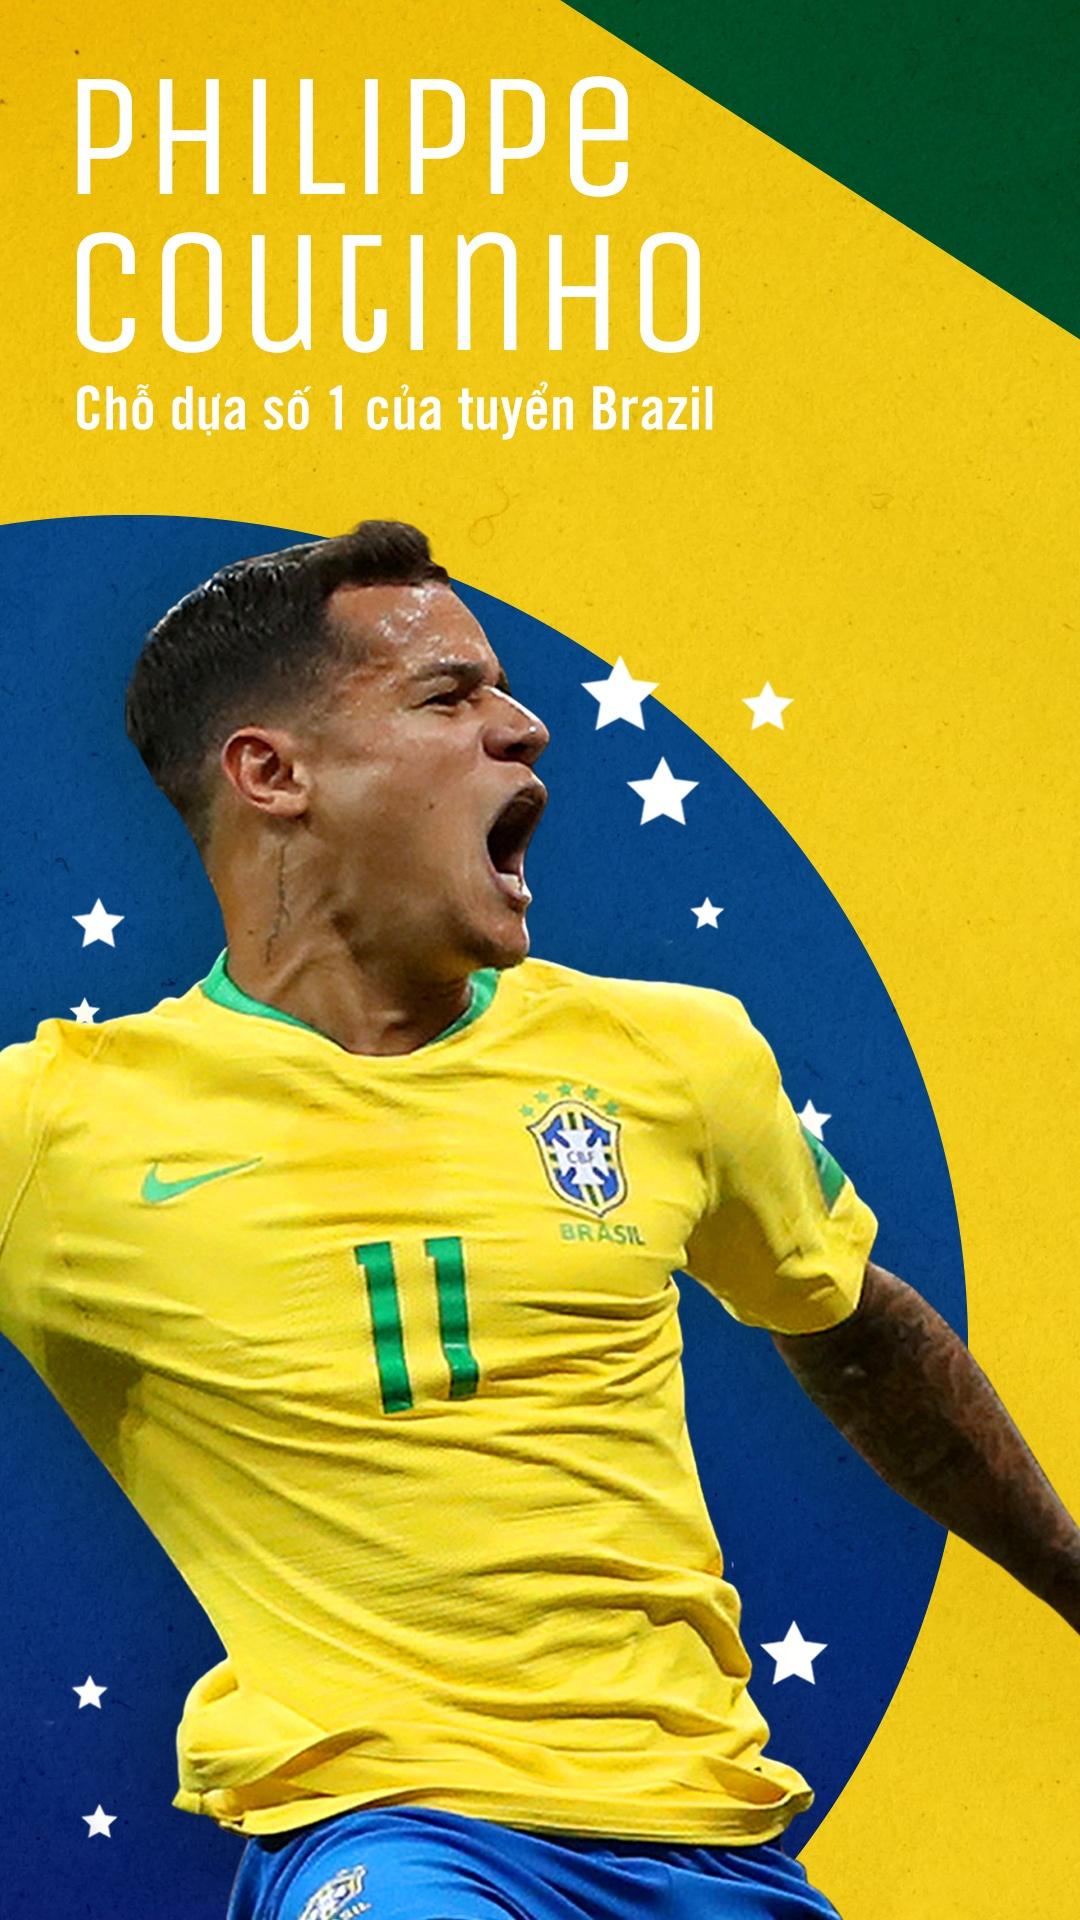 Philippe Coutinho: Cho dua so 1 cua tuyen Brazil hinh anh 1